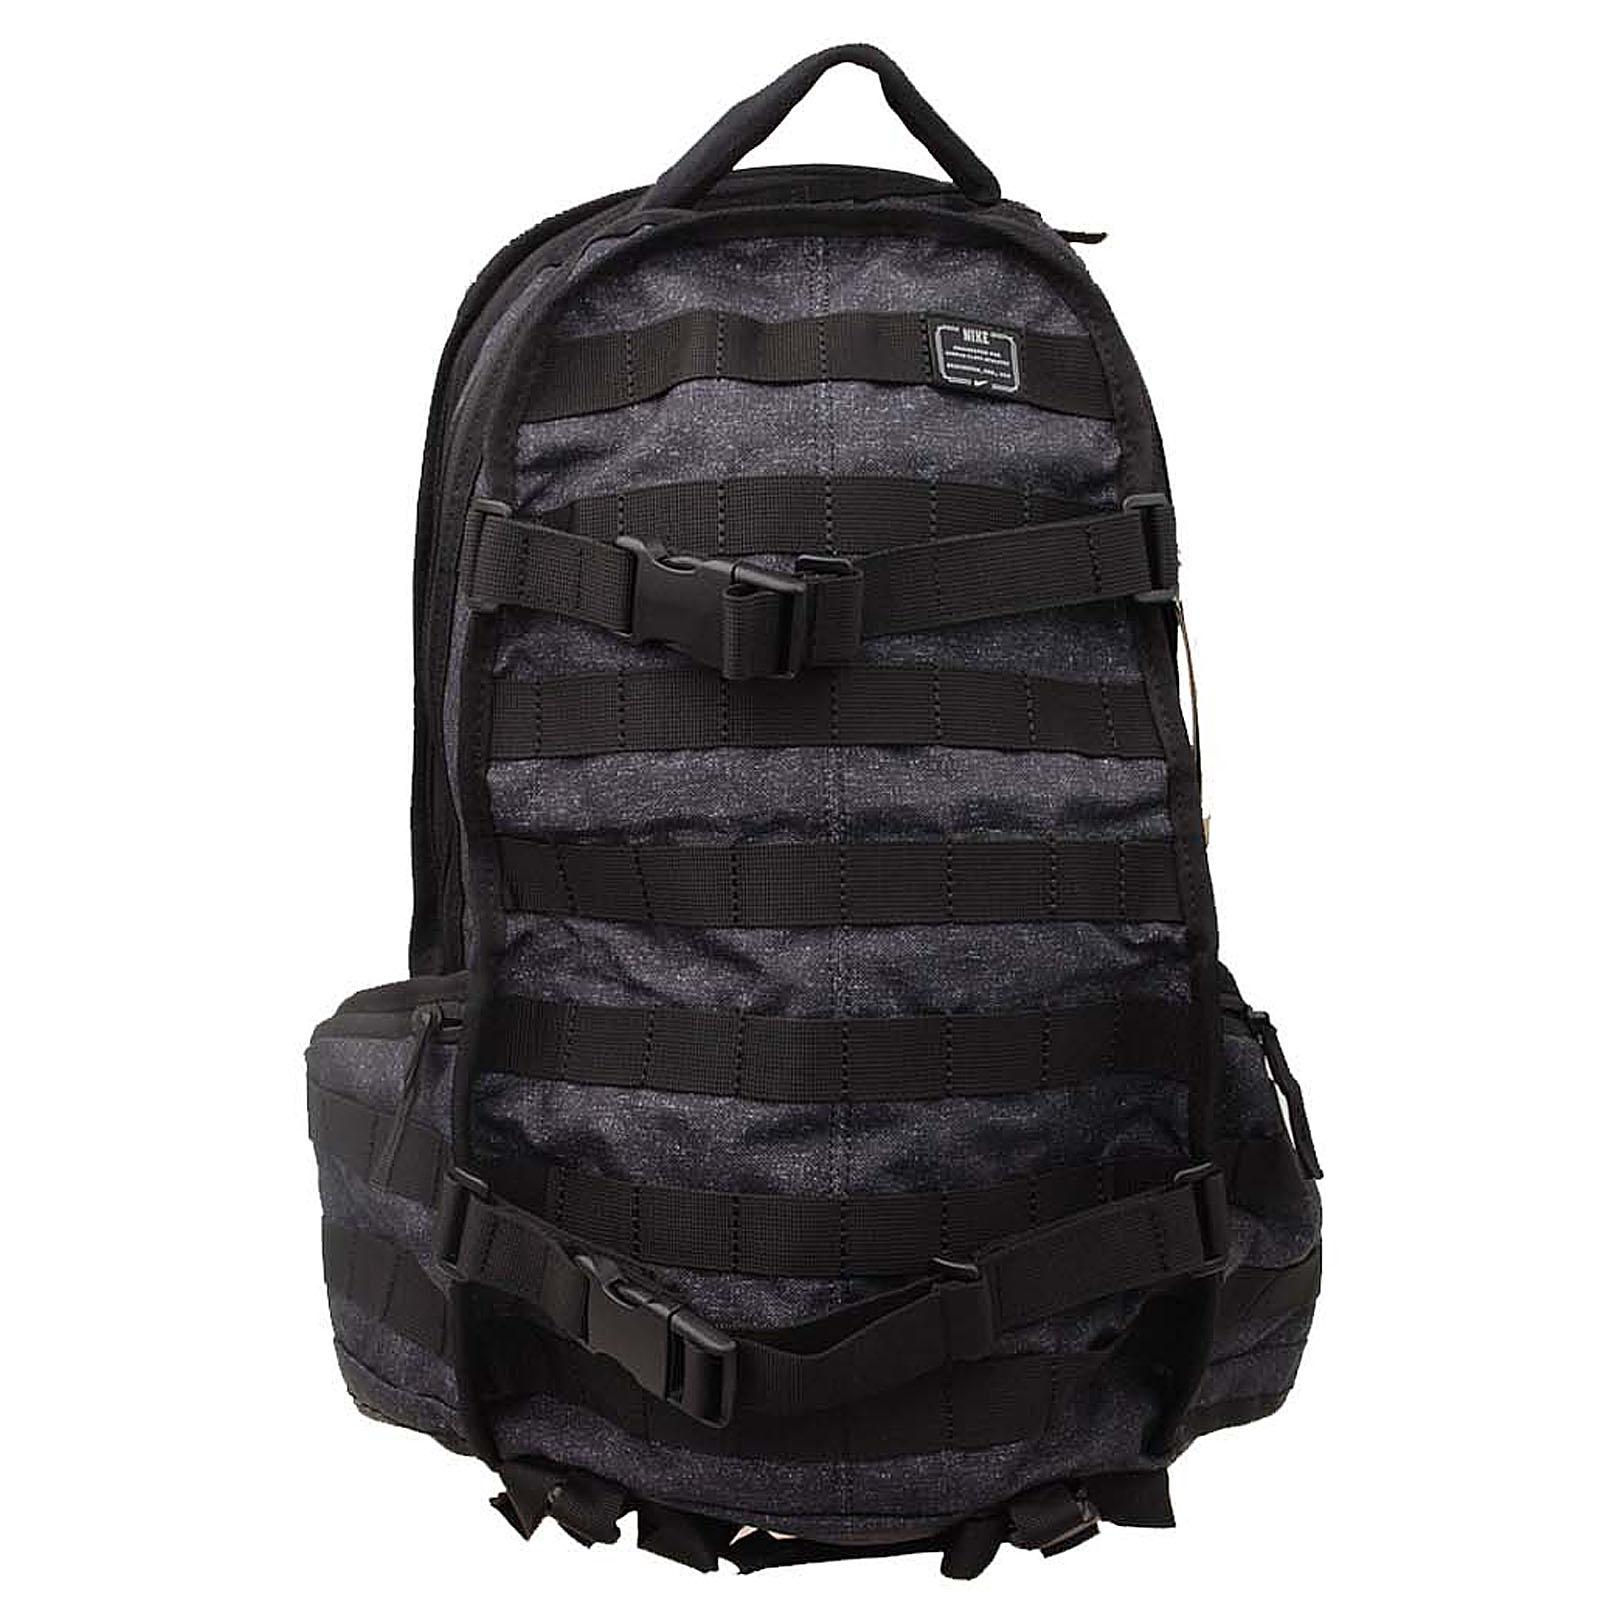 nike sb skate boarding backpack black bookbag laptop